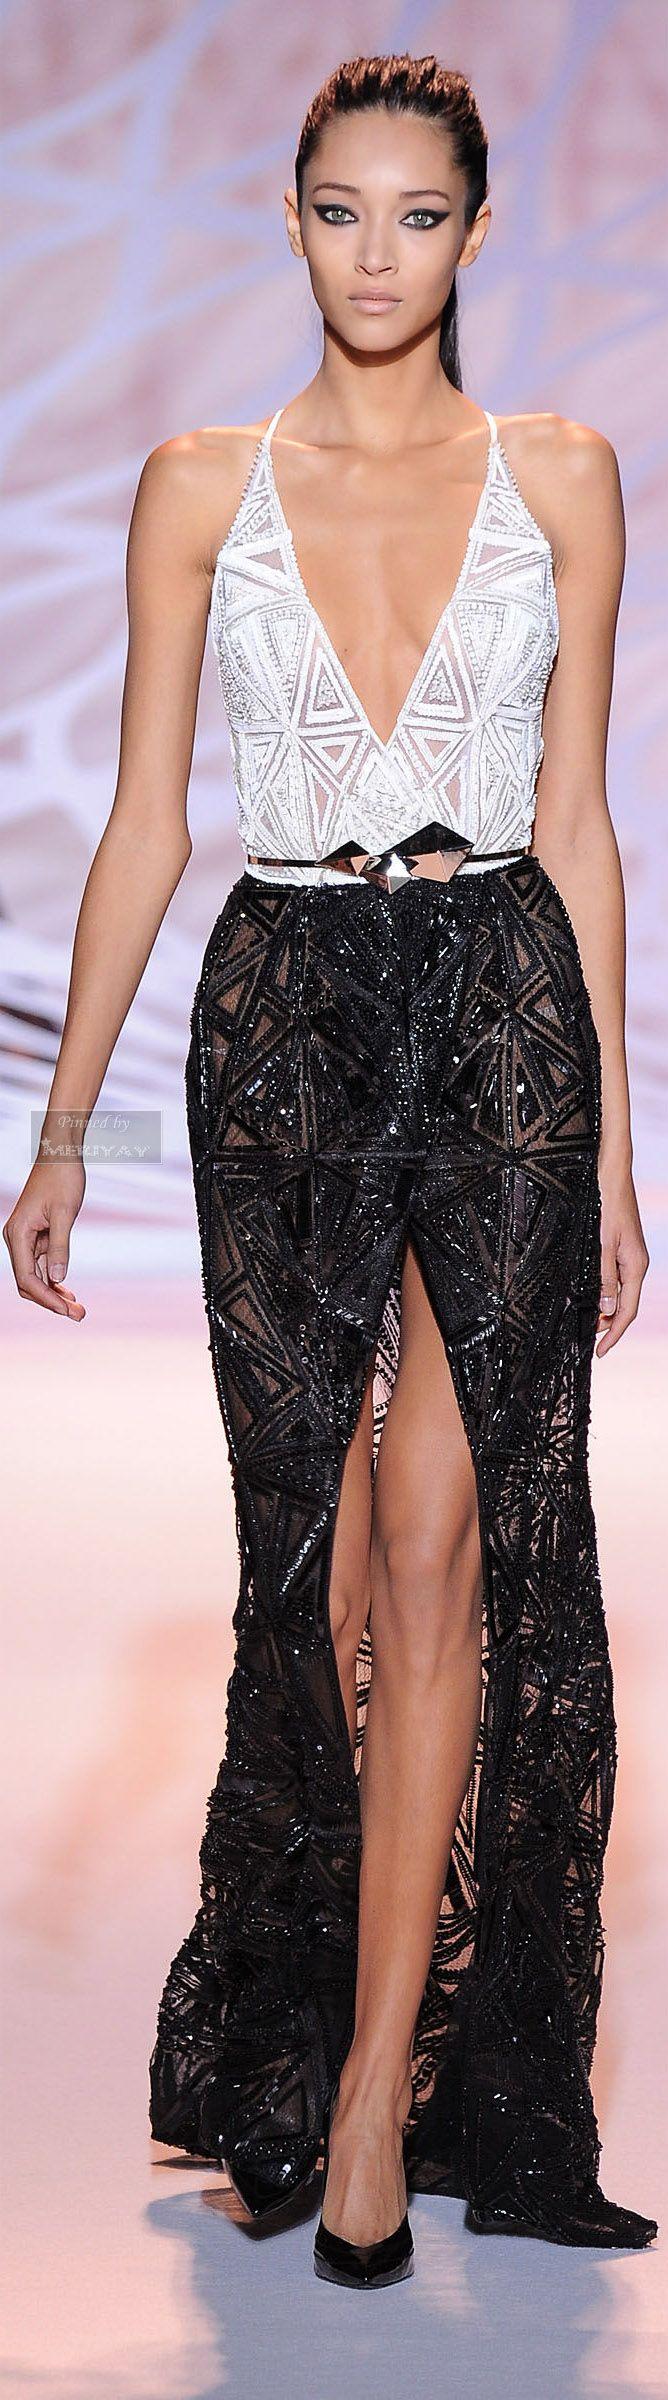 Daniela de Jesus for Zuhair Murad Haute Couture Fall 2014... so classic.